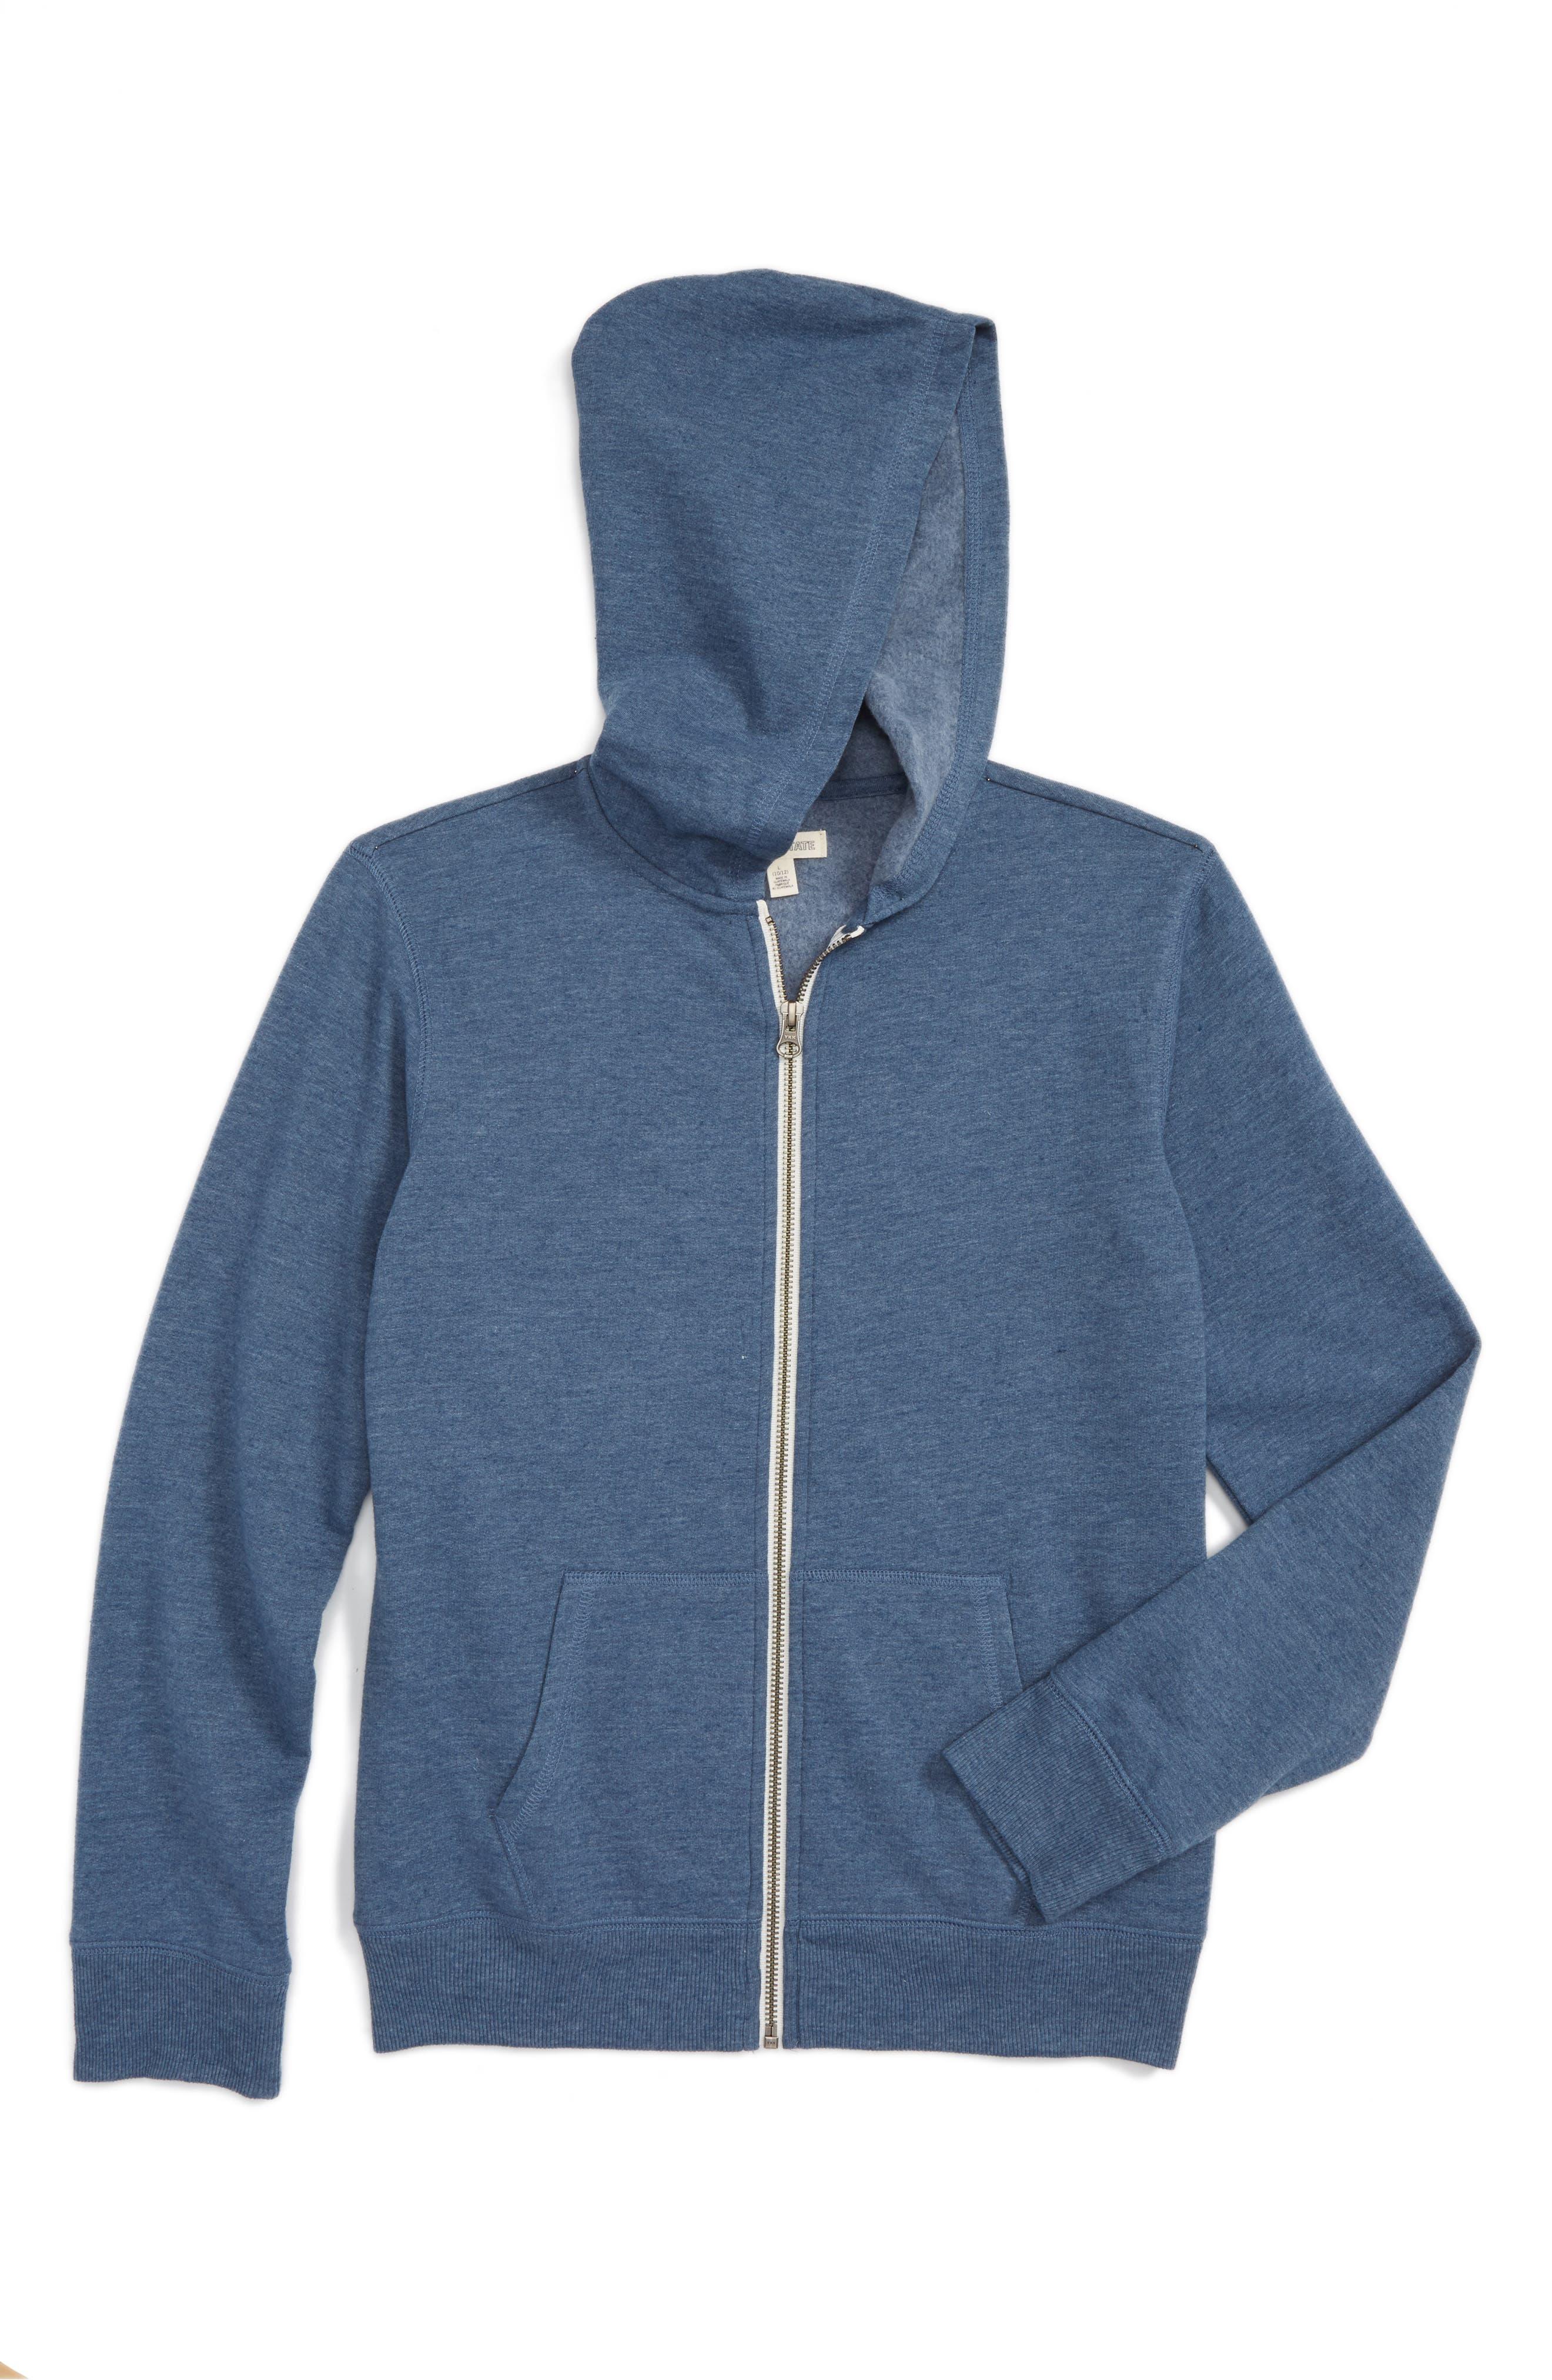 Main Image - Tucker + Tate Zip-Up Hooded Sweatshirt (Toddler Boys, Little Boys & Big Boys)